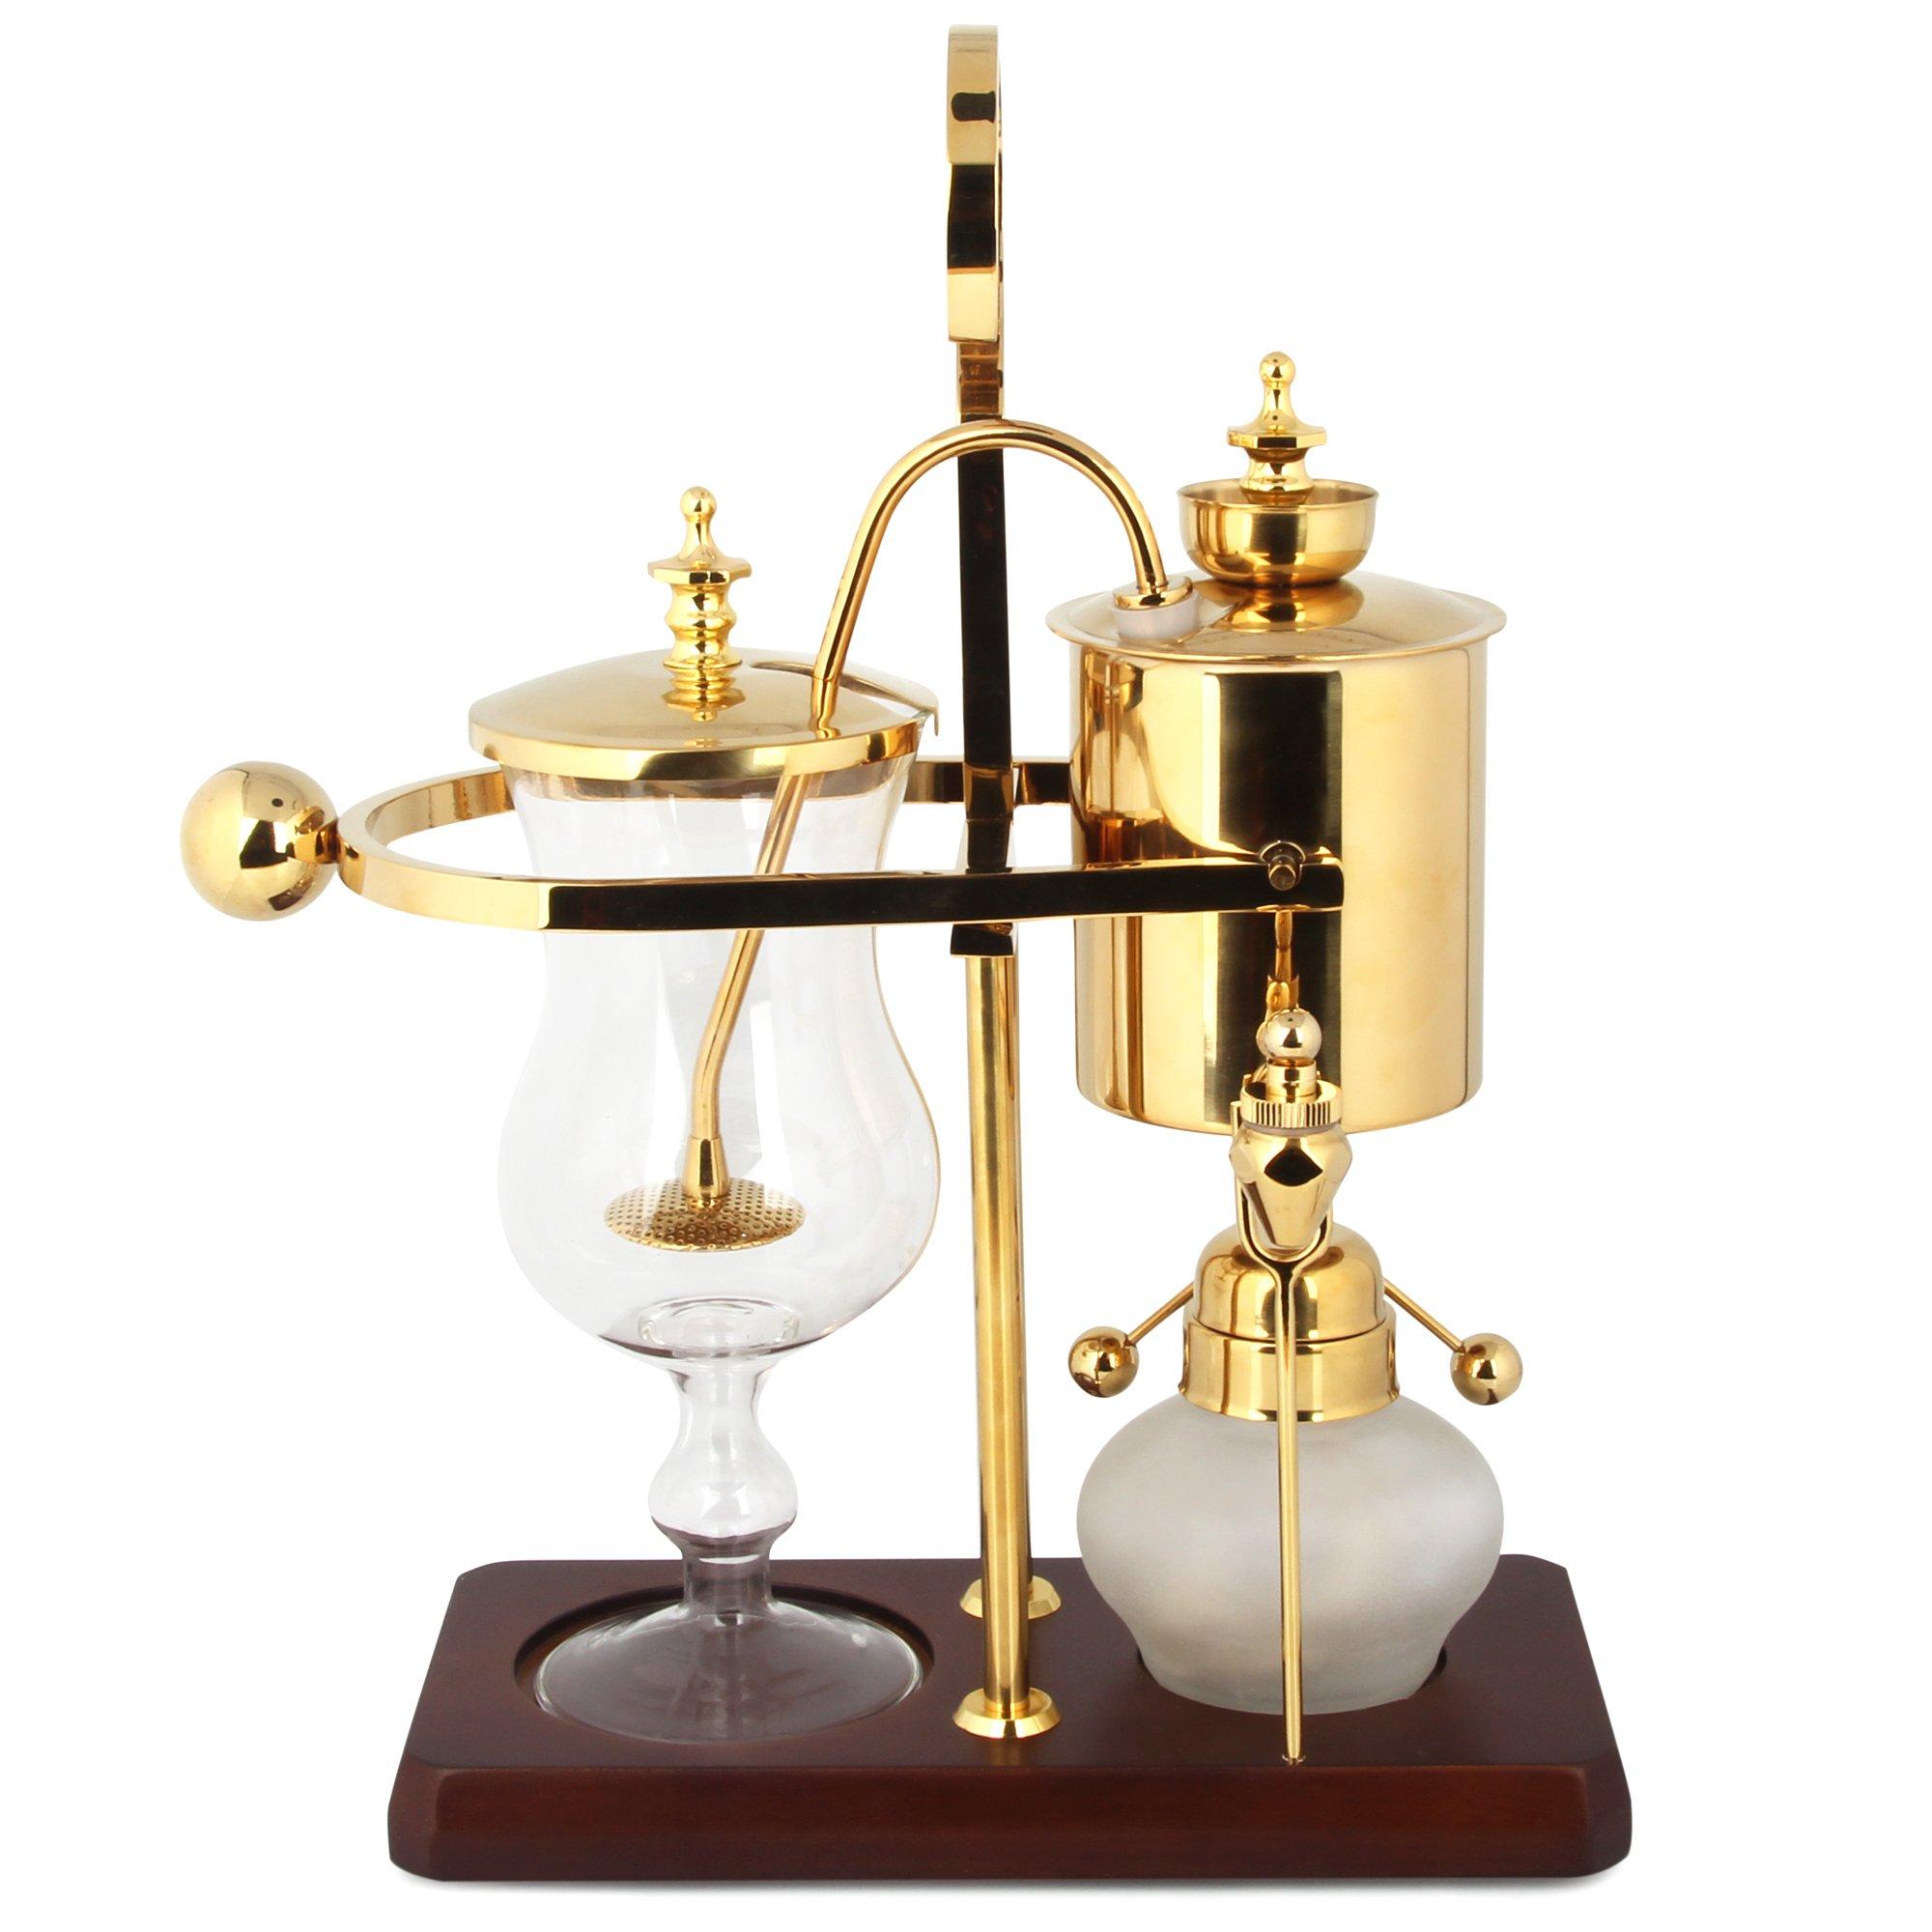 Kendal Balance Syphon Siphon Coffee Maker Gold Color, 1 set by Kendal